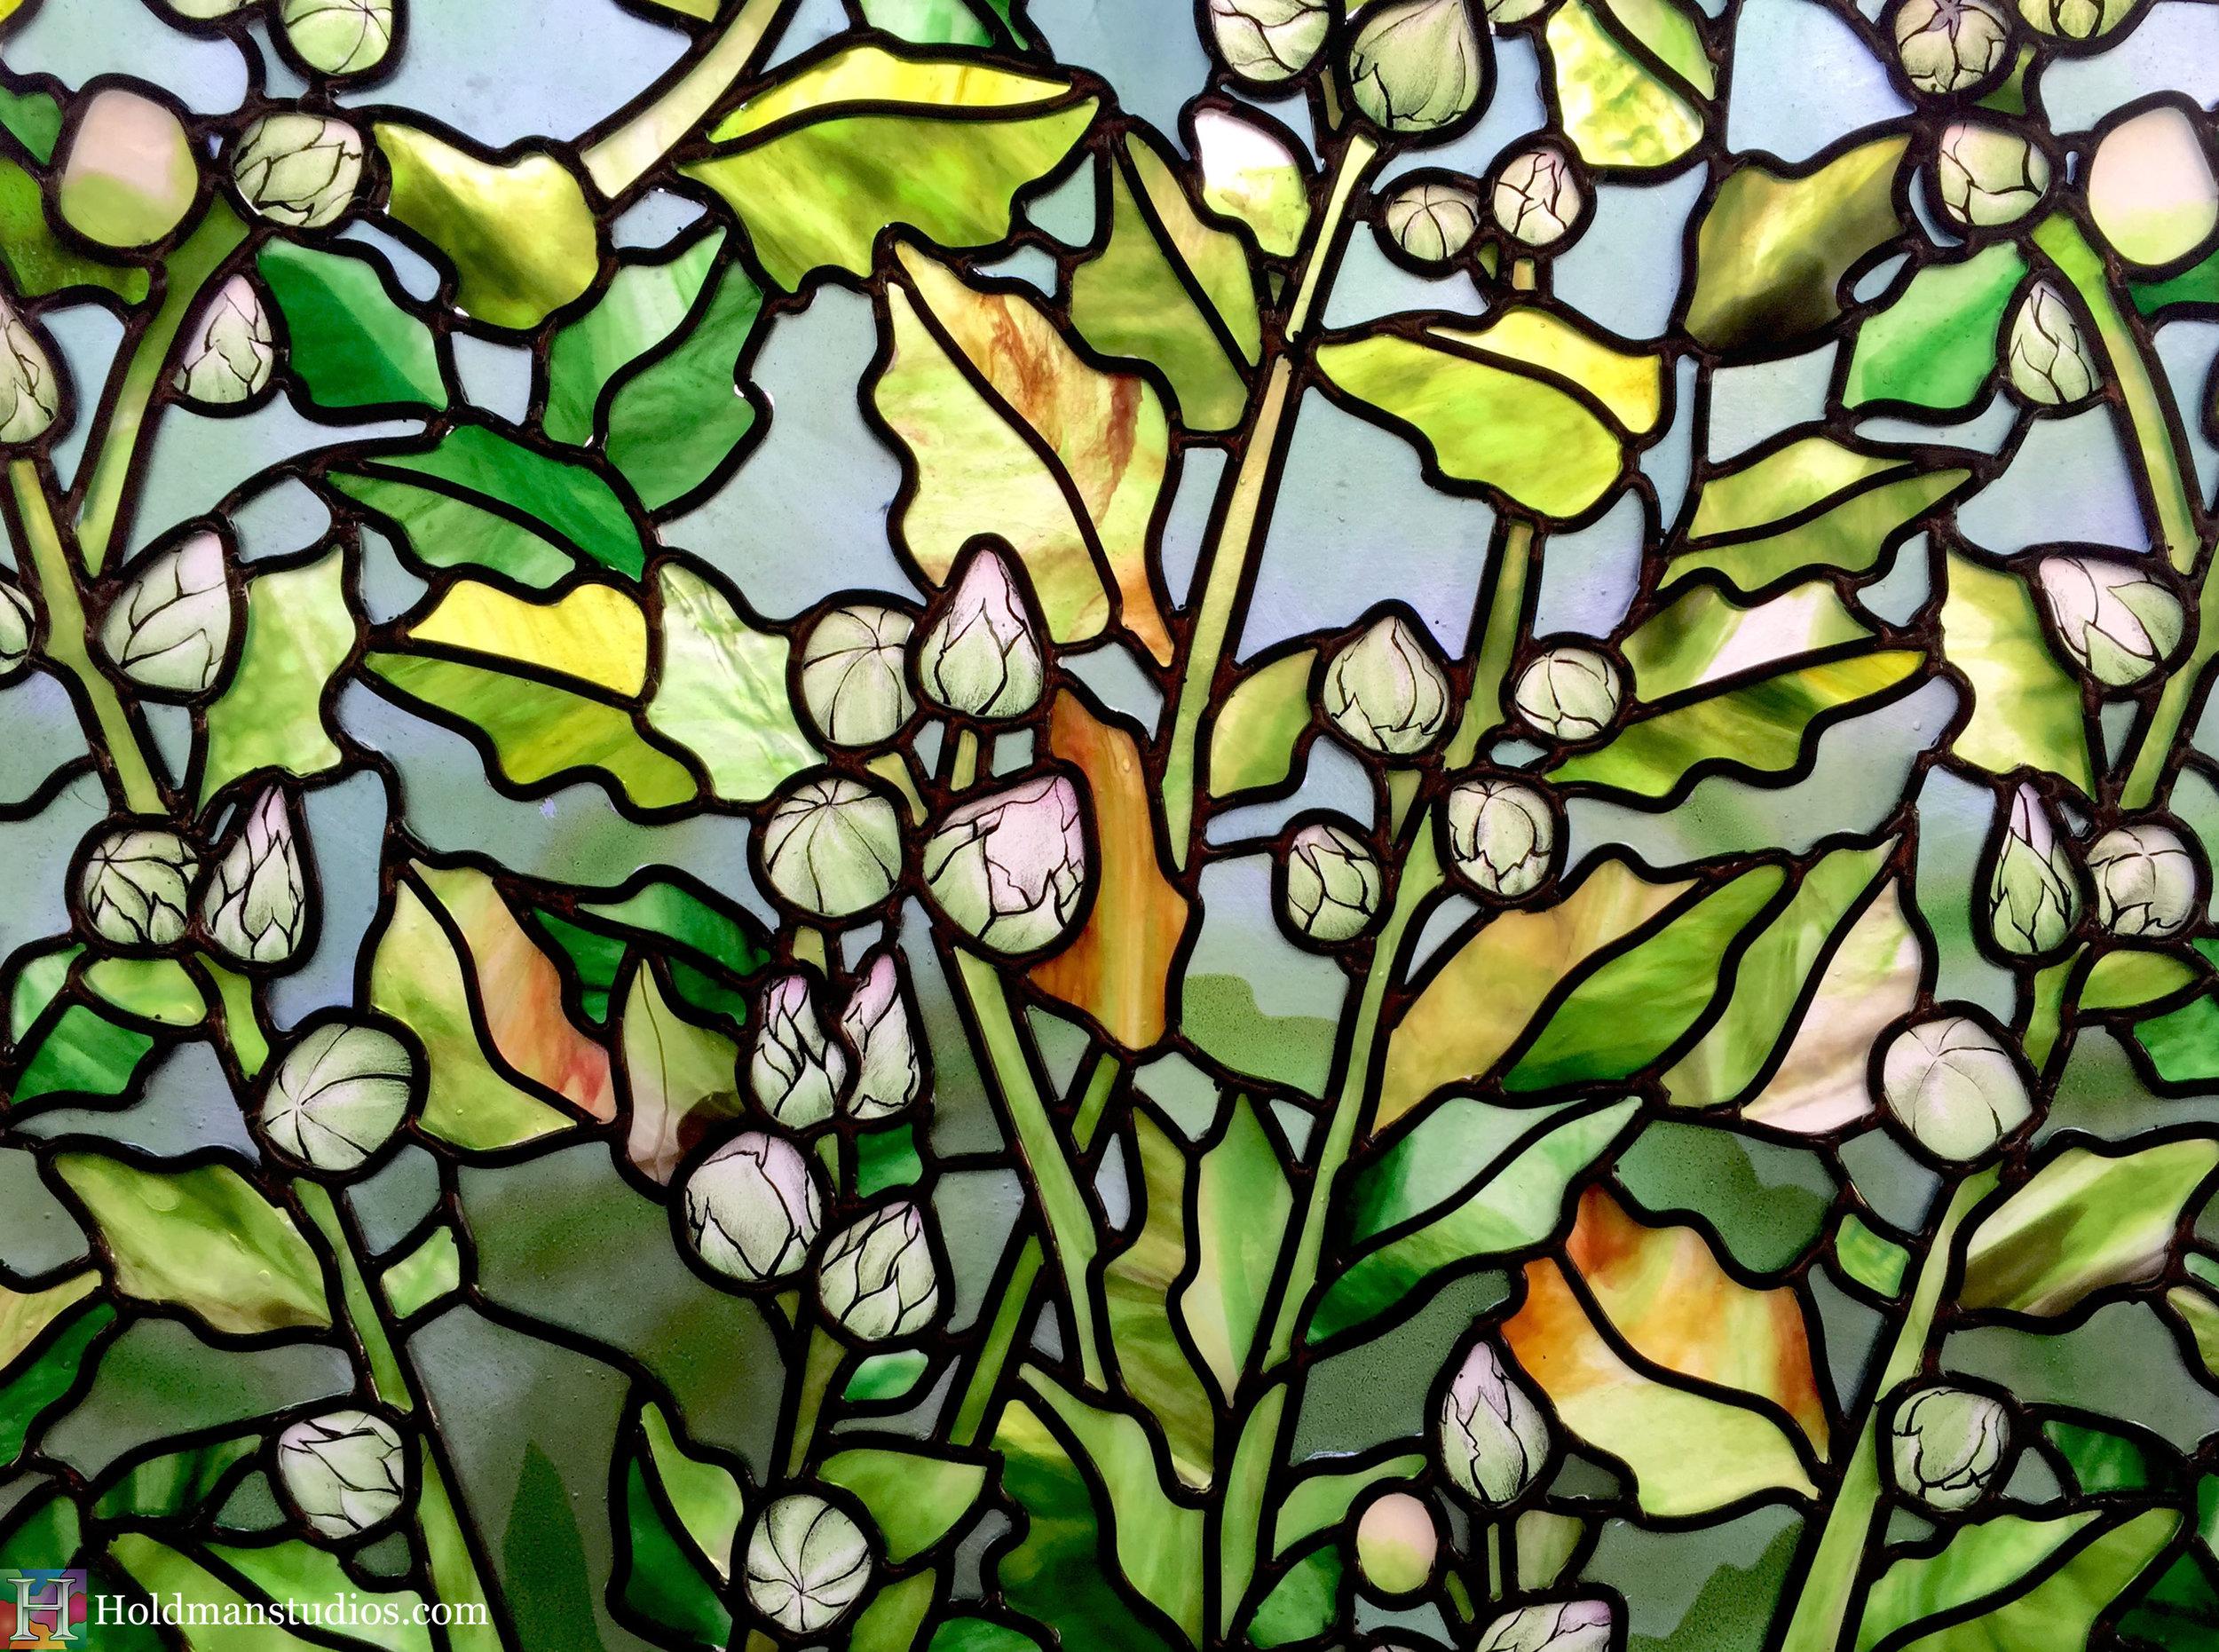 Holdman-Studios-Stained-Glass-Paris-LDS-Temple-Cornflower-Blue-Lily-Flowers-Buds-Leaves-Closeup-Windows.jpg